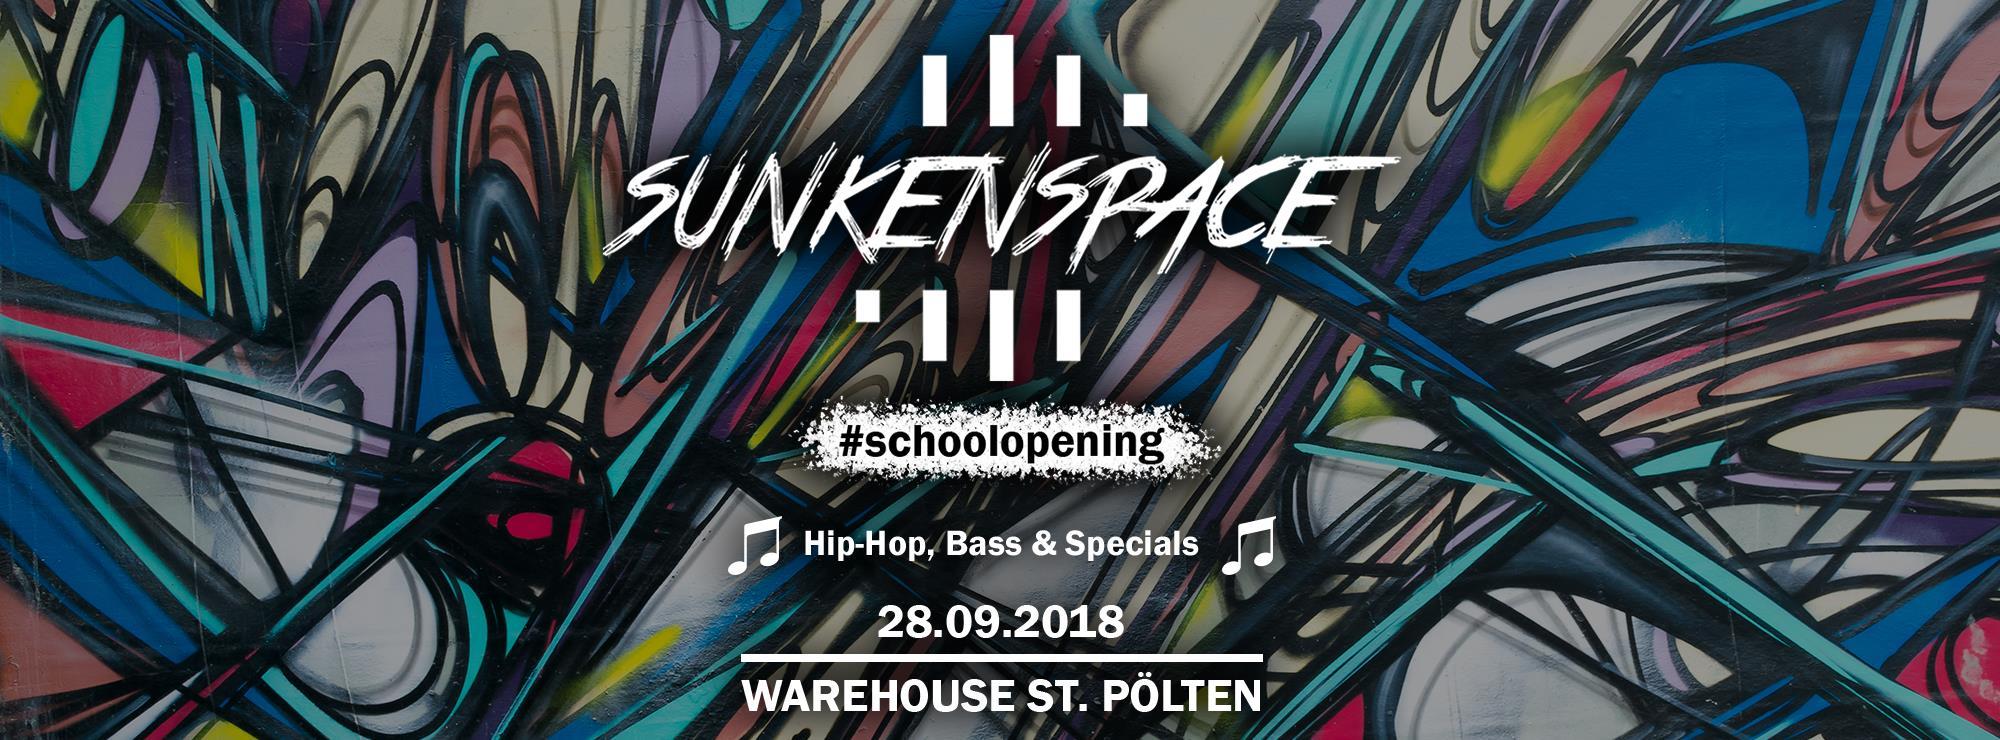 Sunkenspace #schoolopening